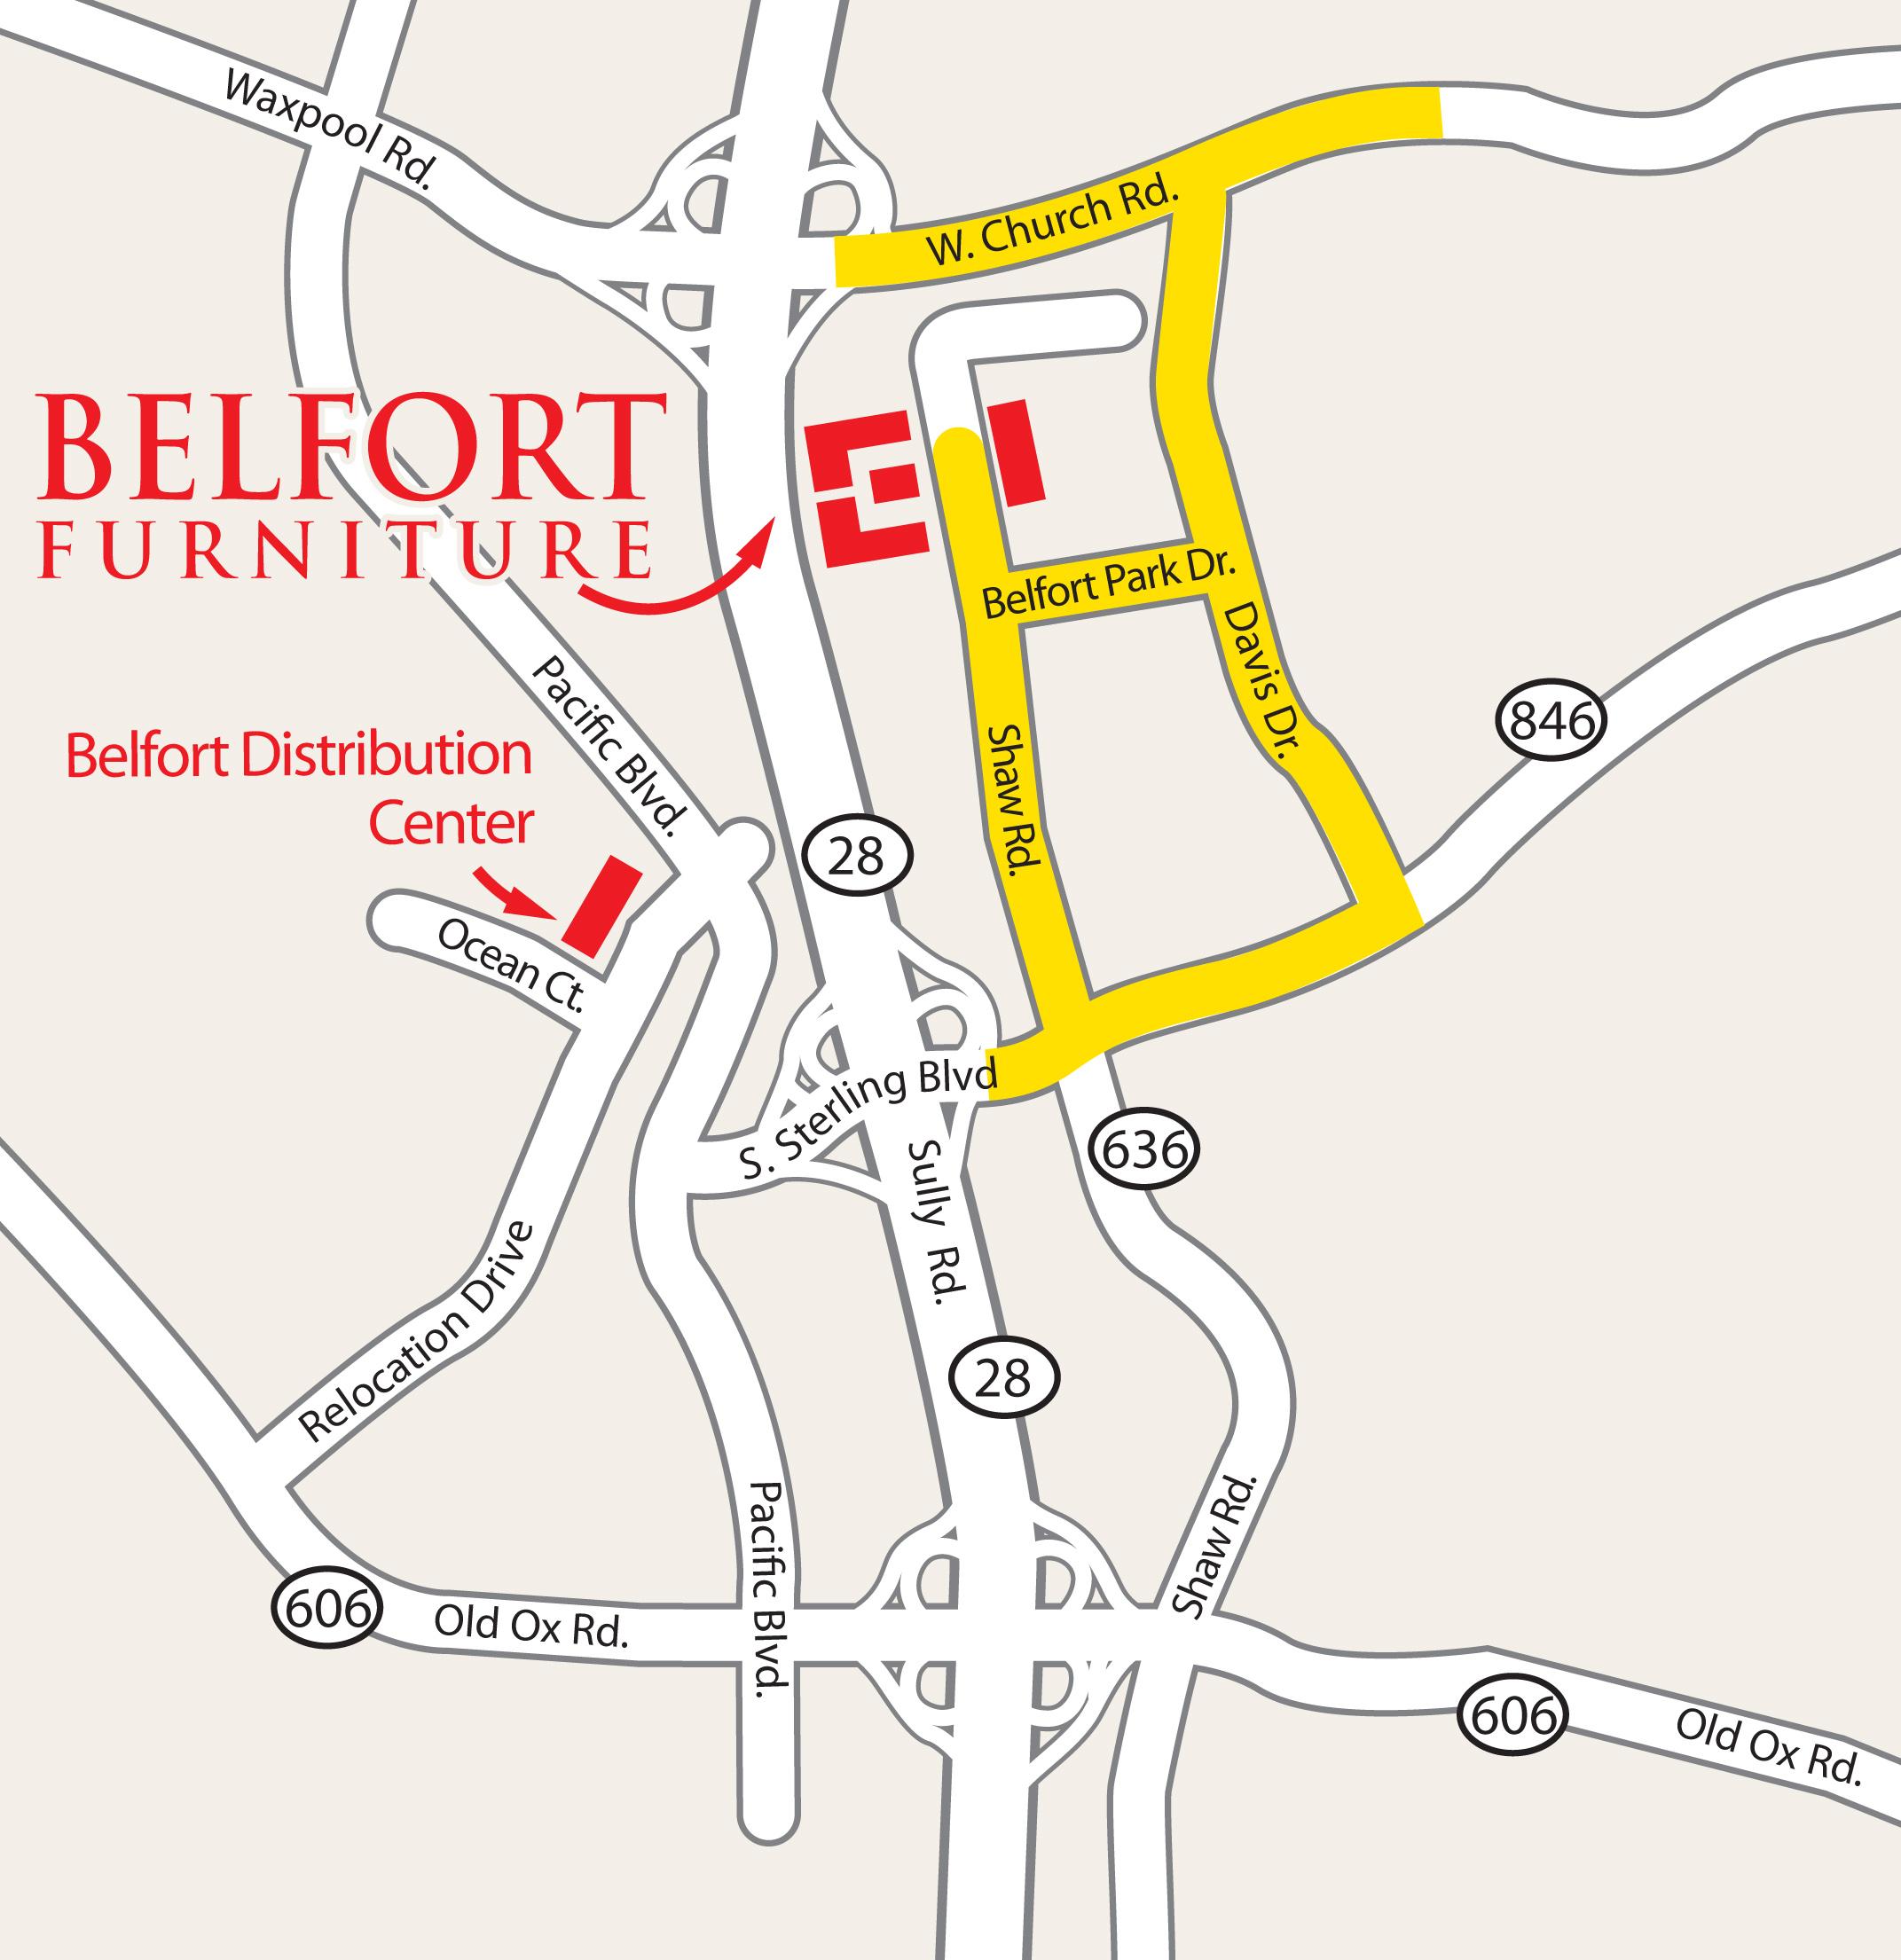 Dulles Sterling Va Furniture Mattress Store Belfort Furniture